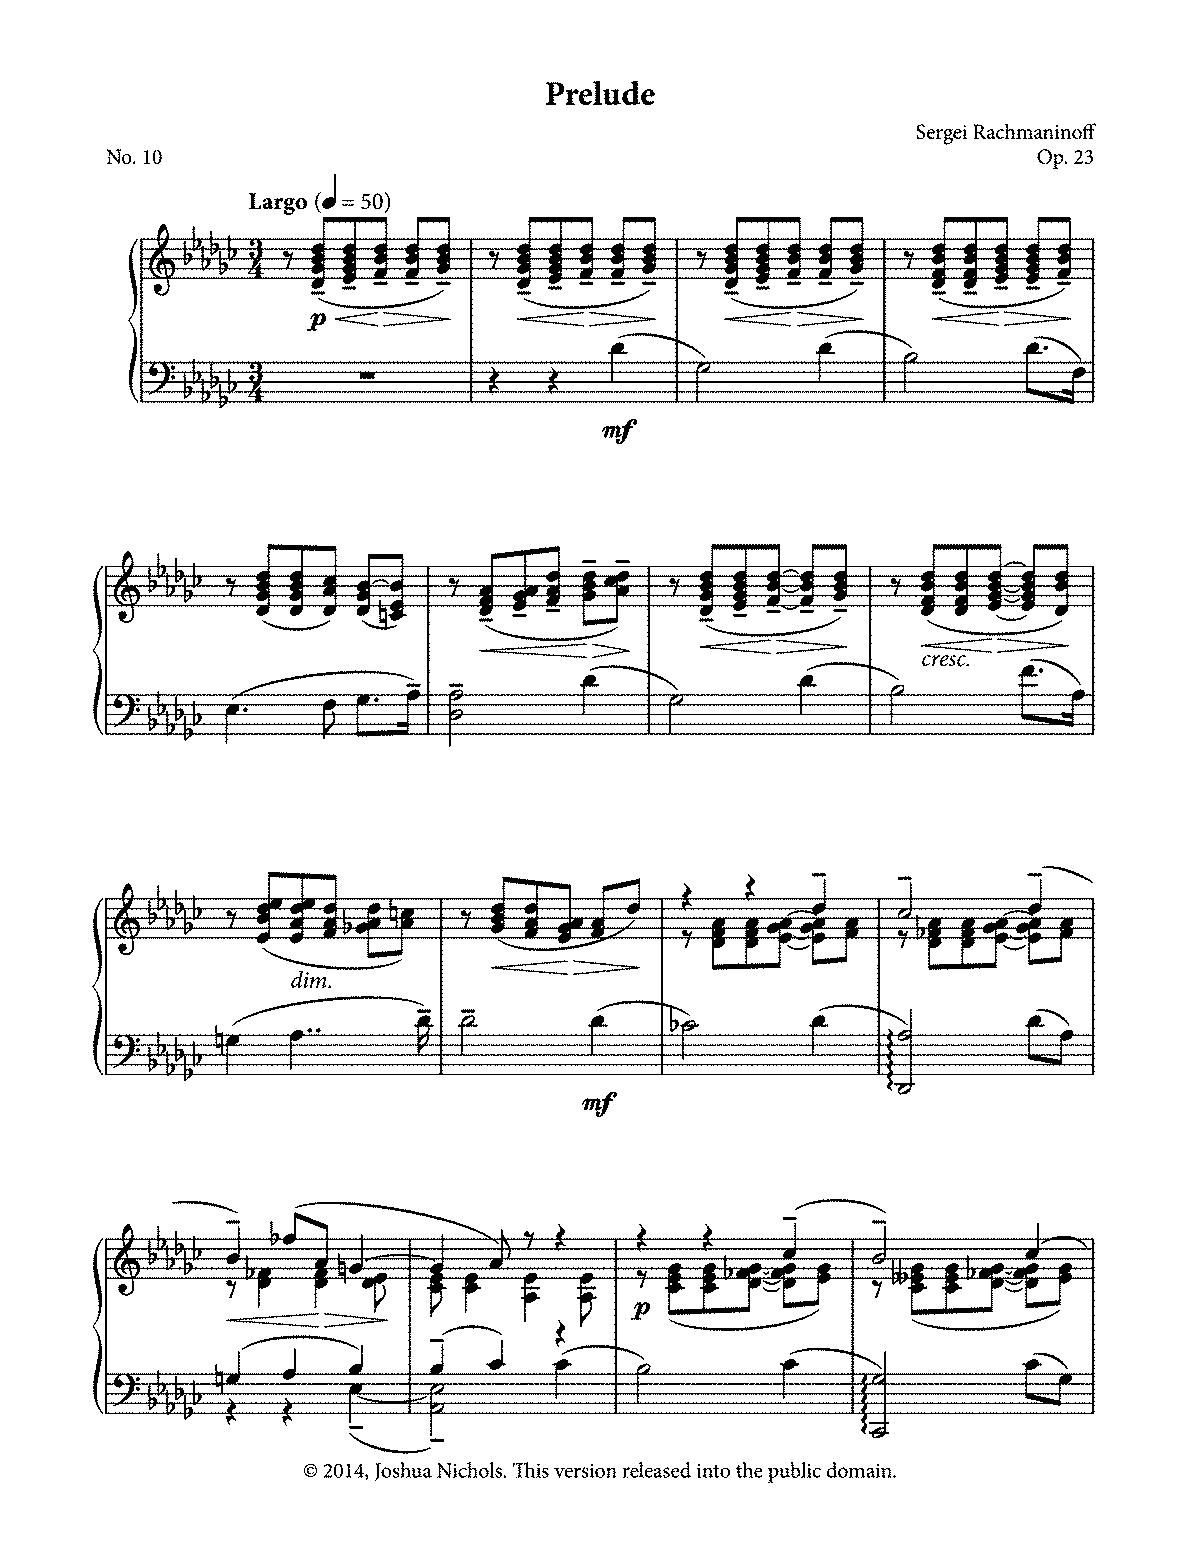 10 Preludes, Op 23 (Rachmaninoff, Sergei) - IMSLP: Free